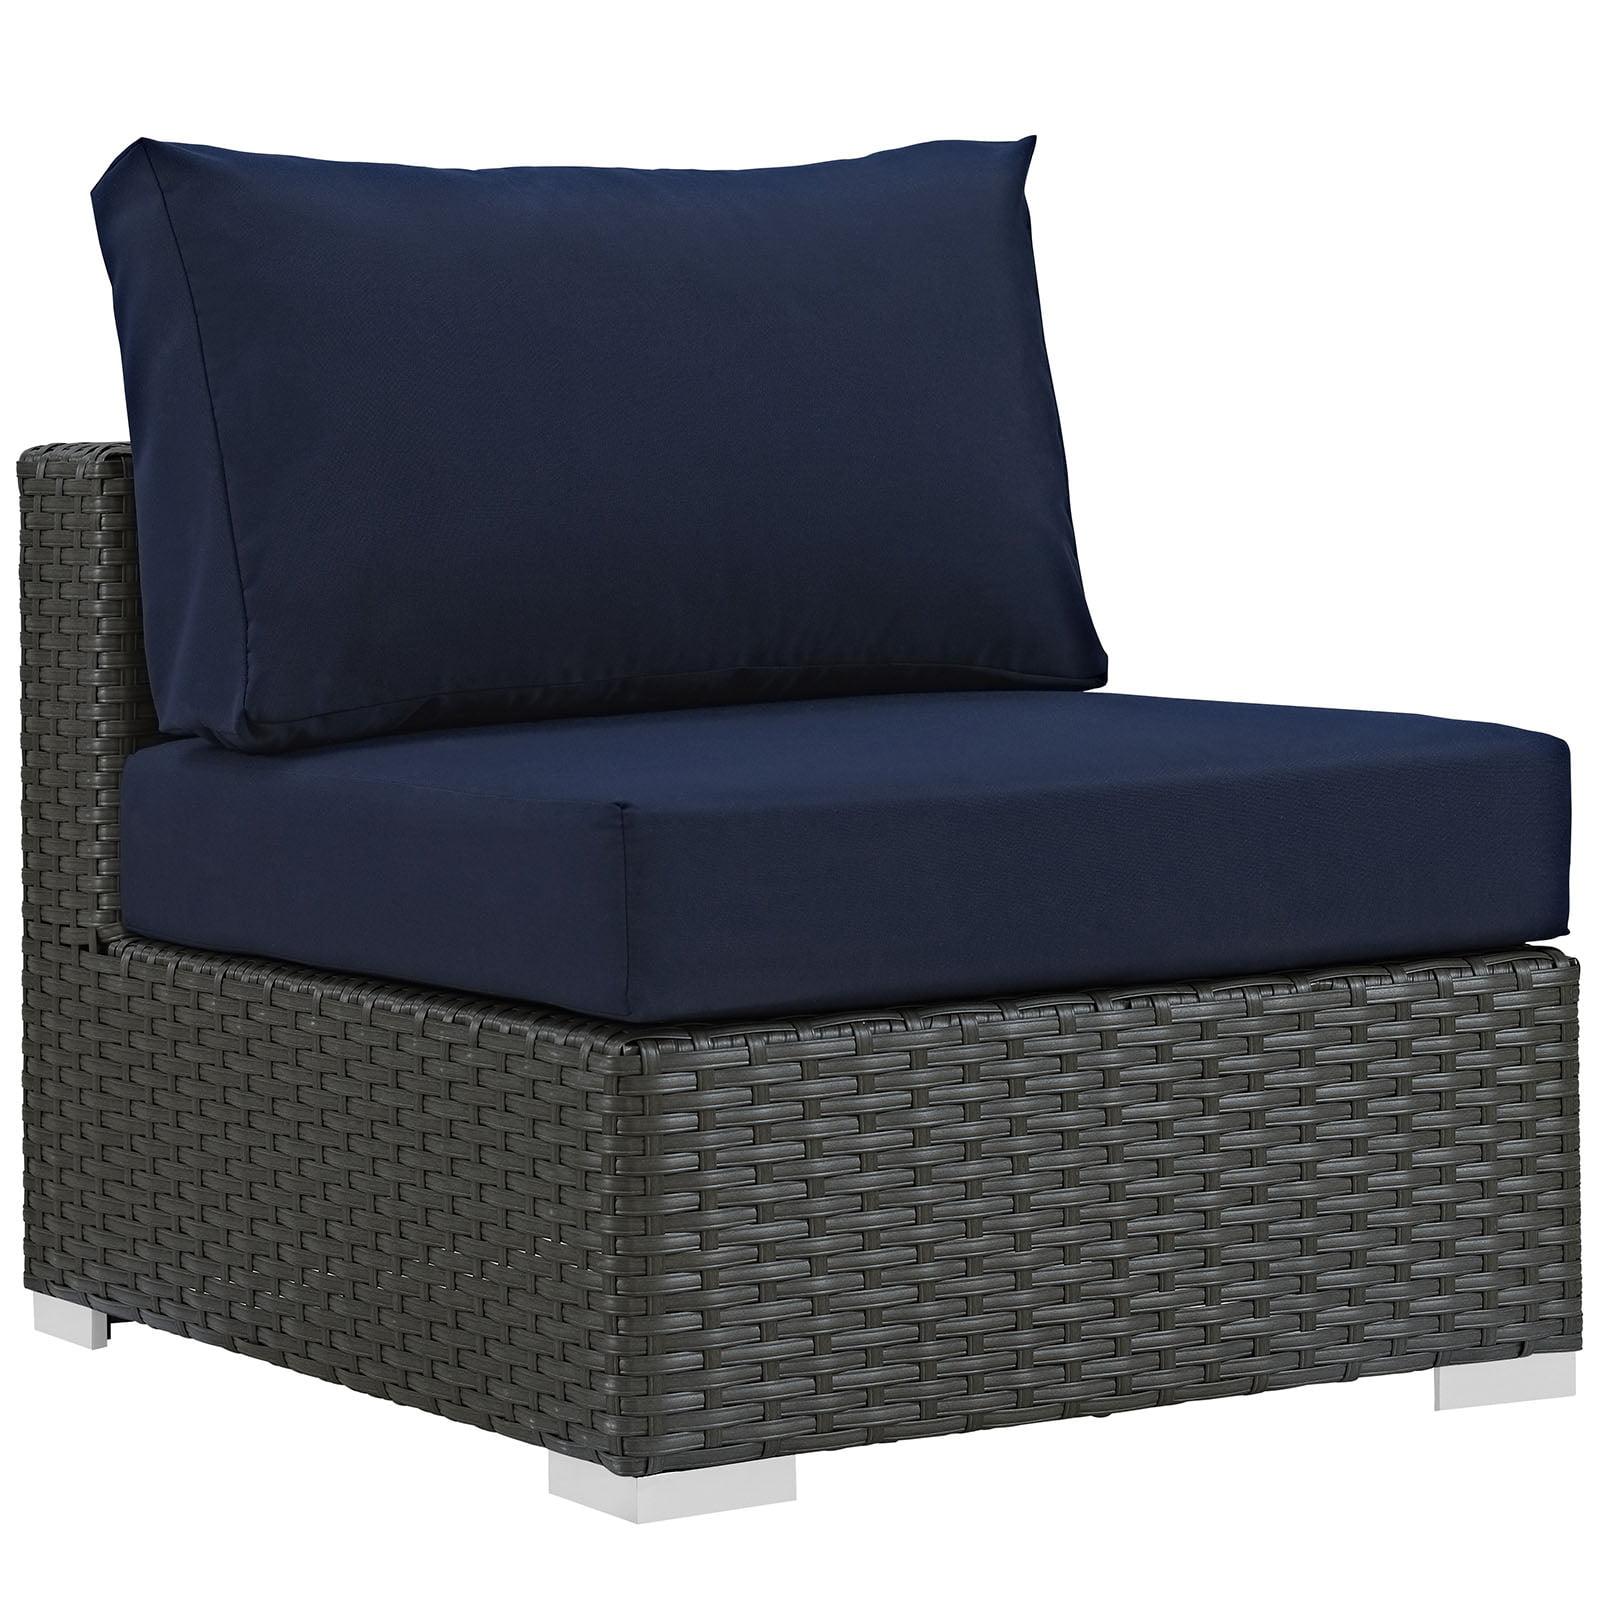 Modern Contemporary Urban Design Outdoor Patio Balcony Lounge Chair, Navy Blue, Rattan